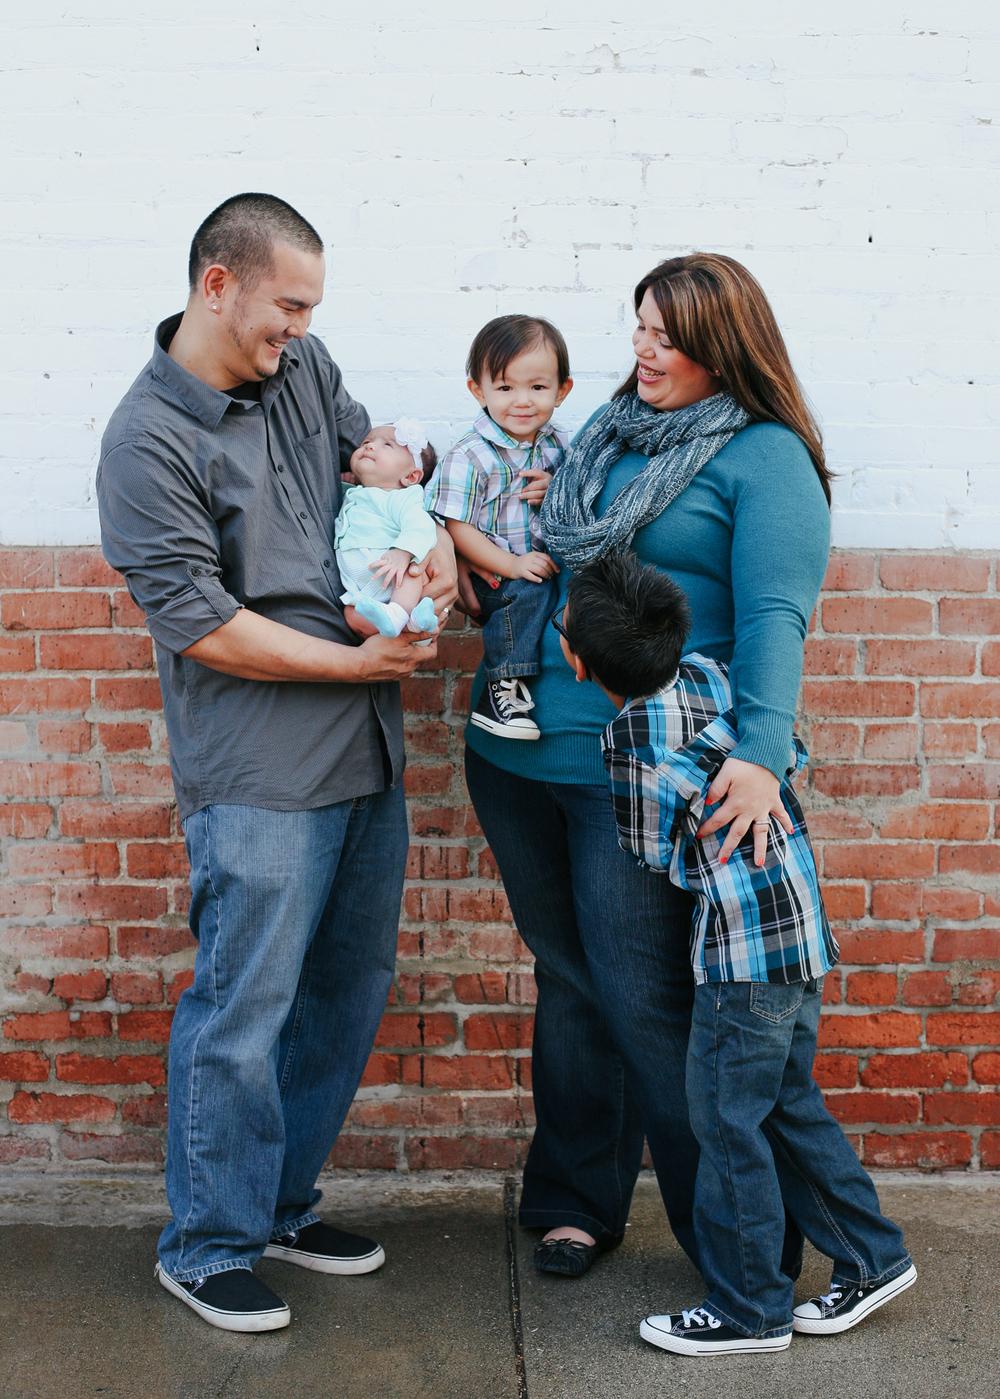 familieswebsite-7.jpg